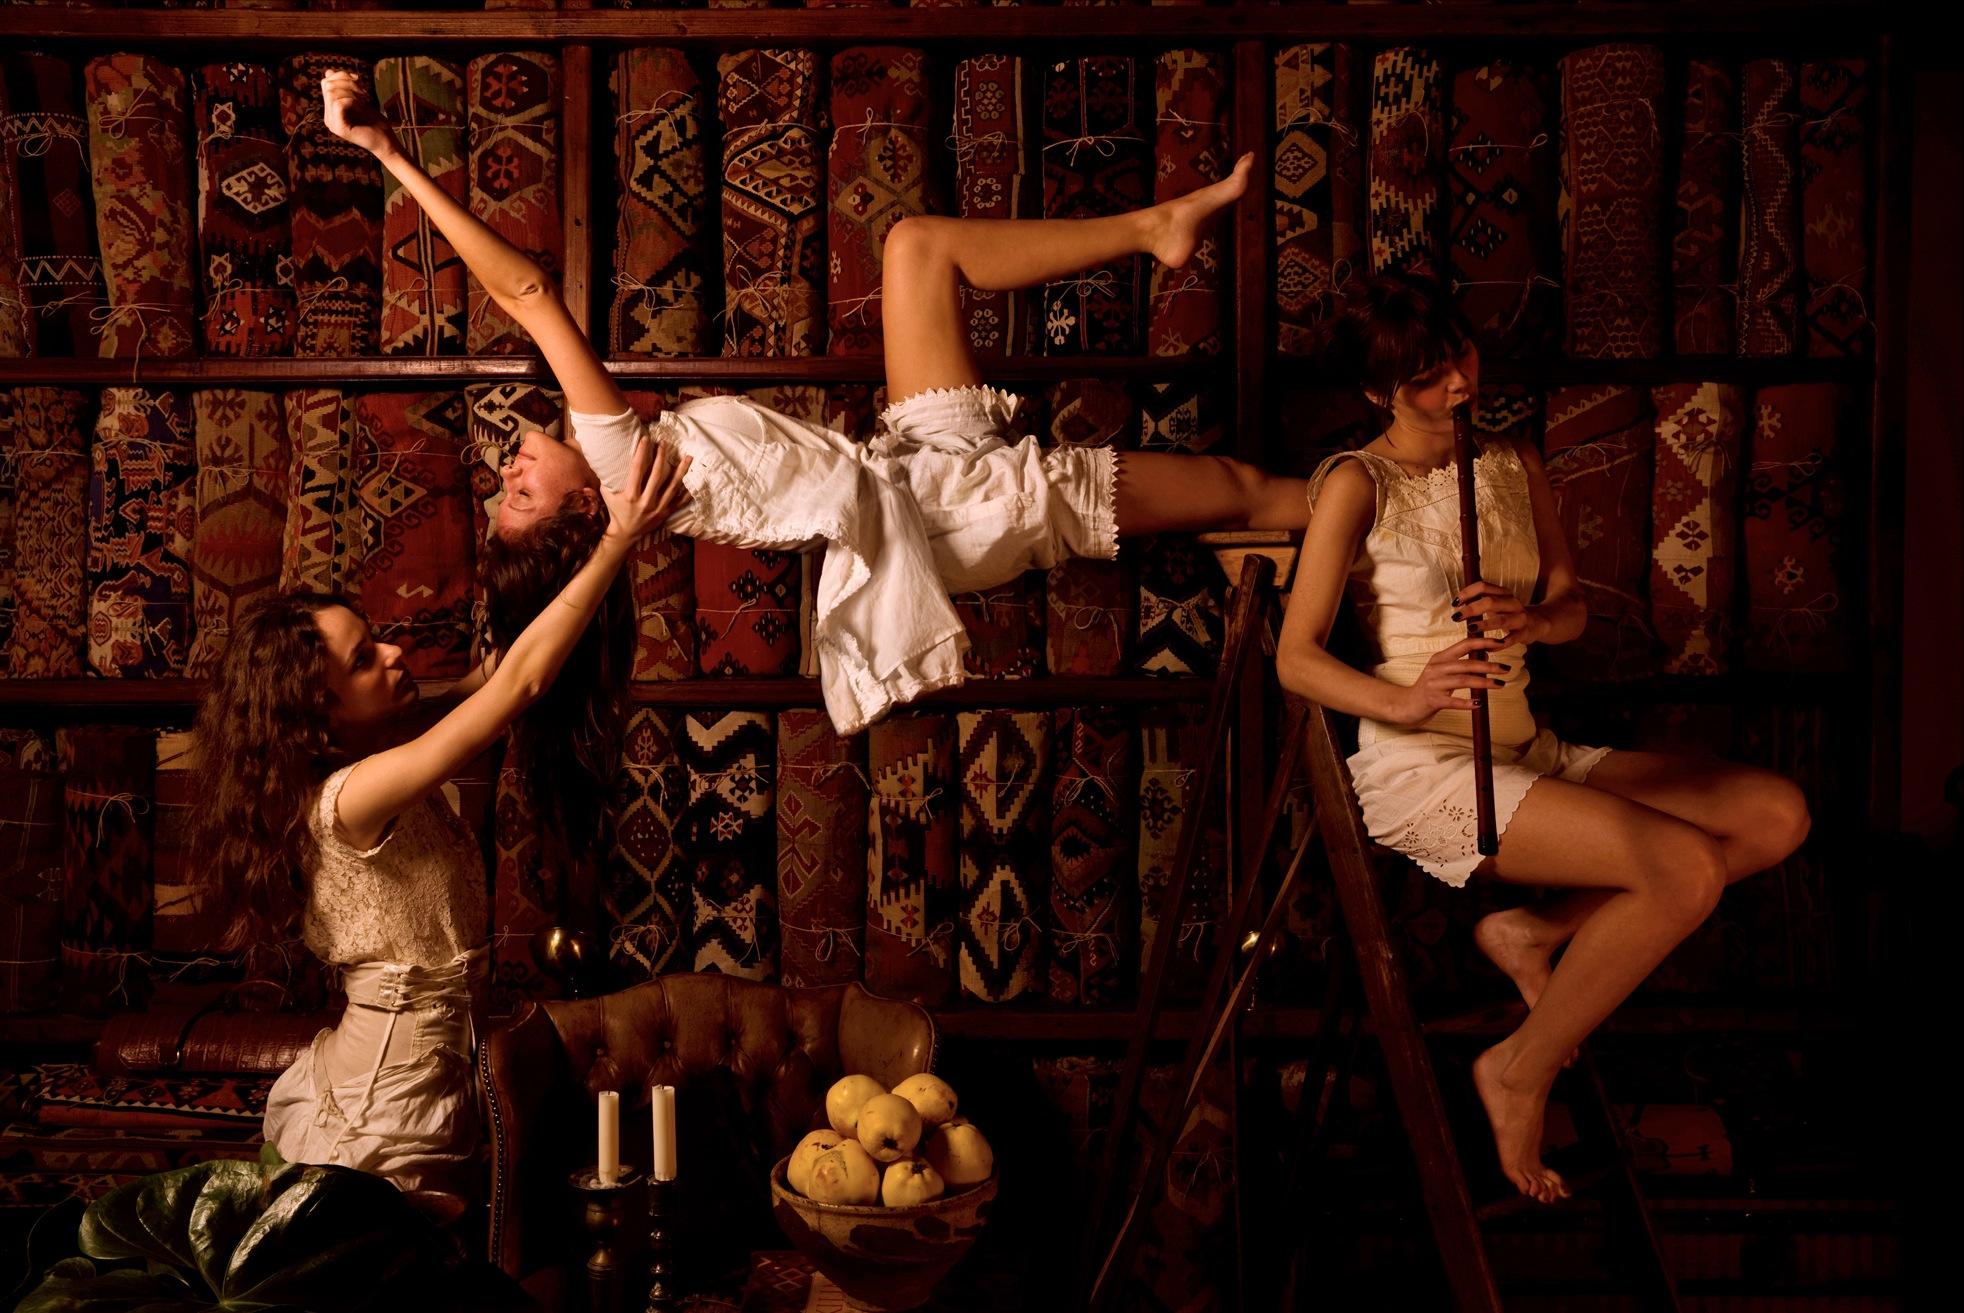 02 Magic Carpets (2010)